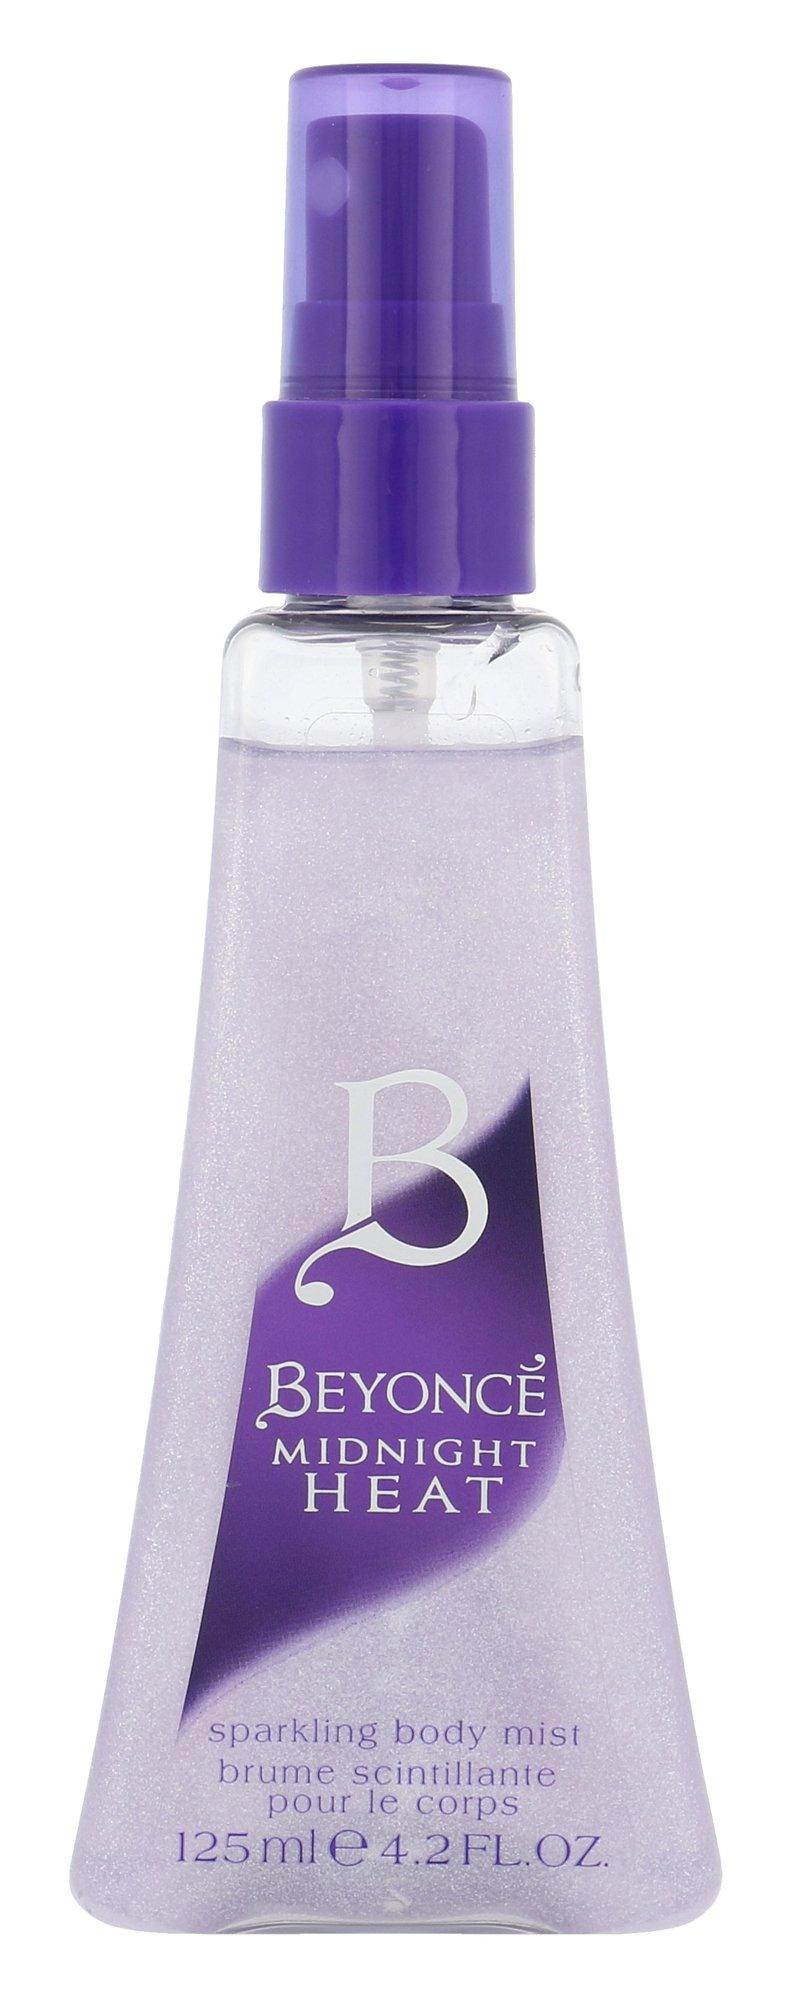 Beyonce Midnight Heat Body veil 125ml